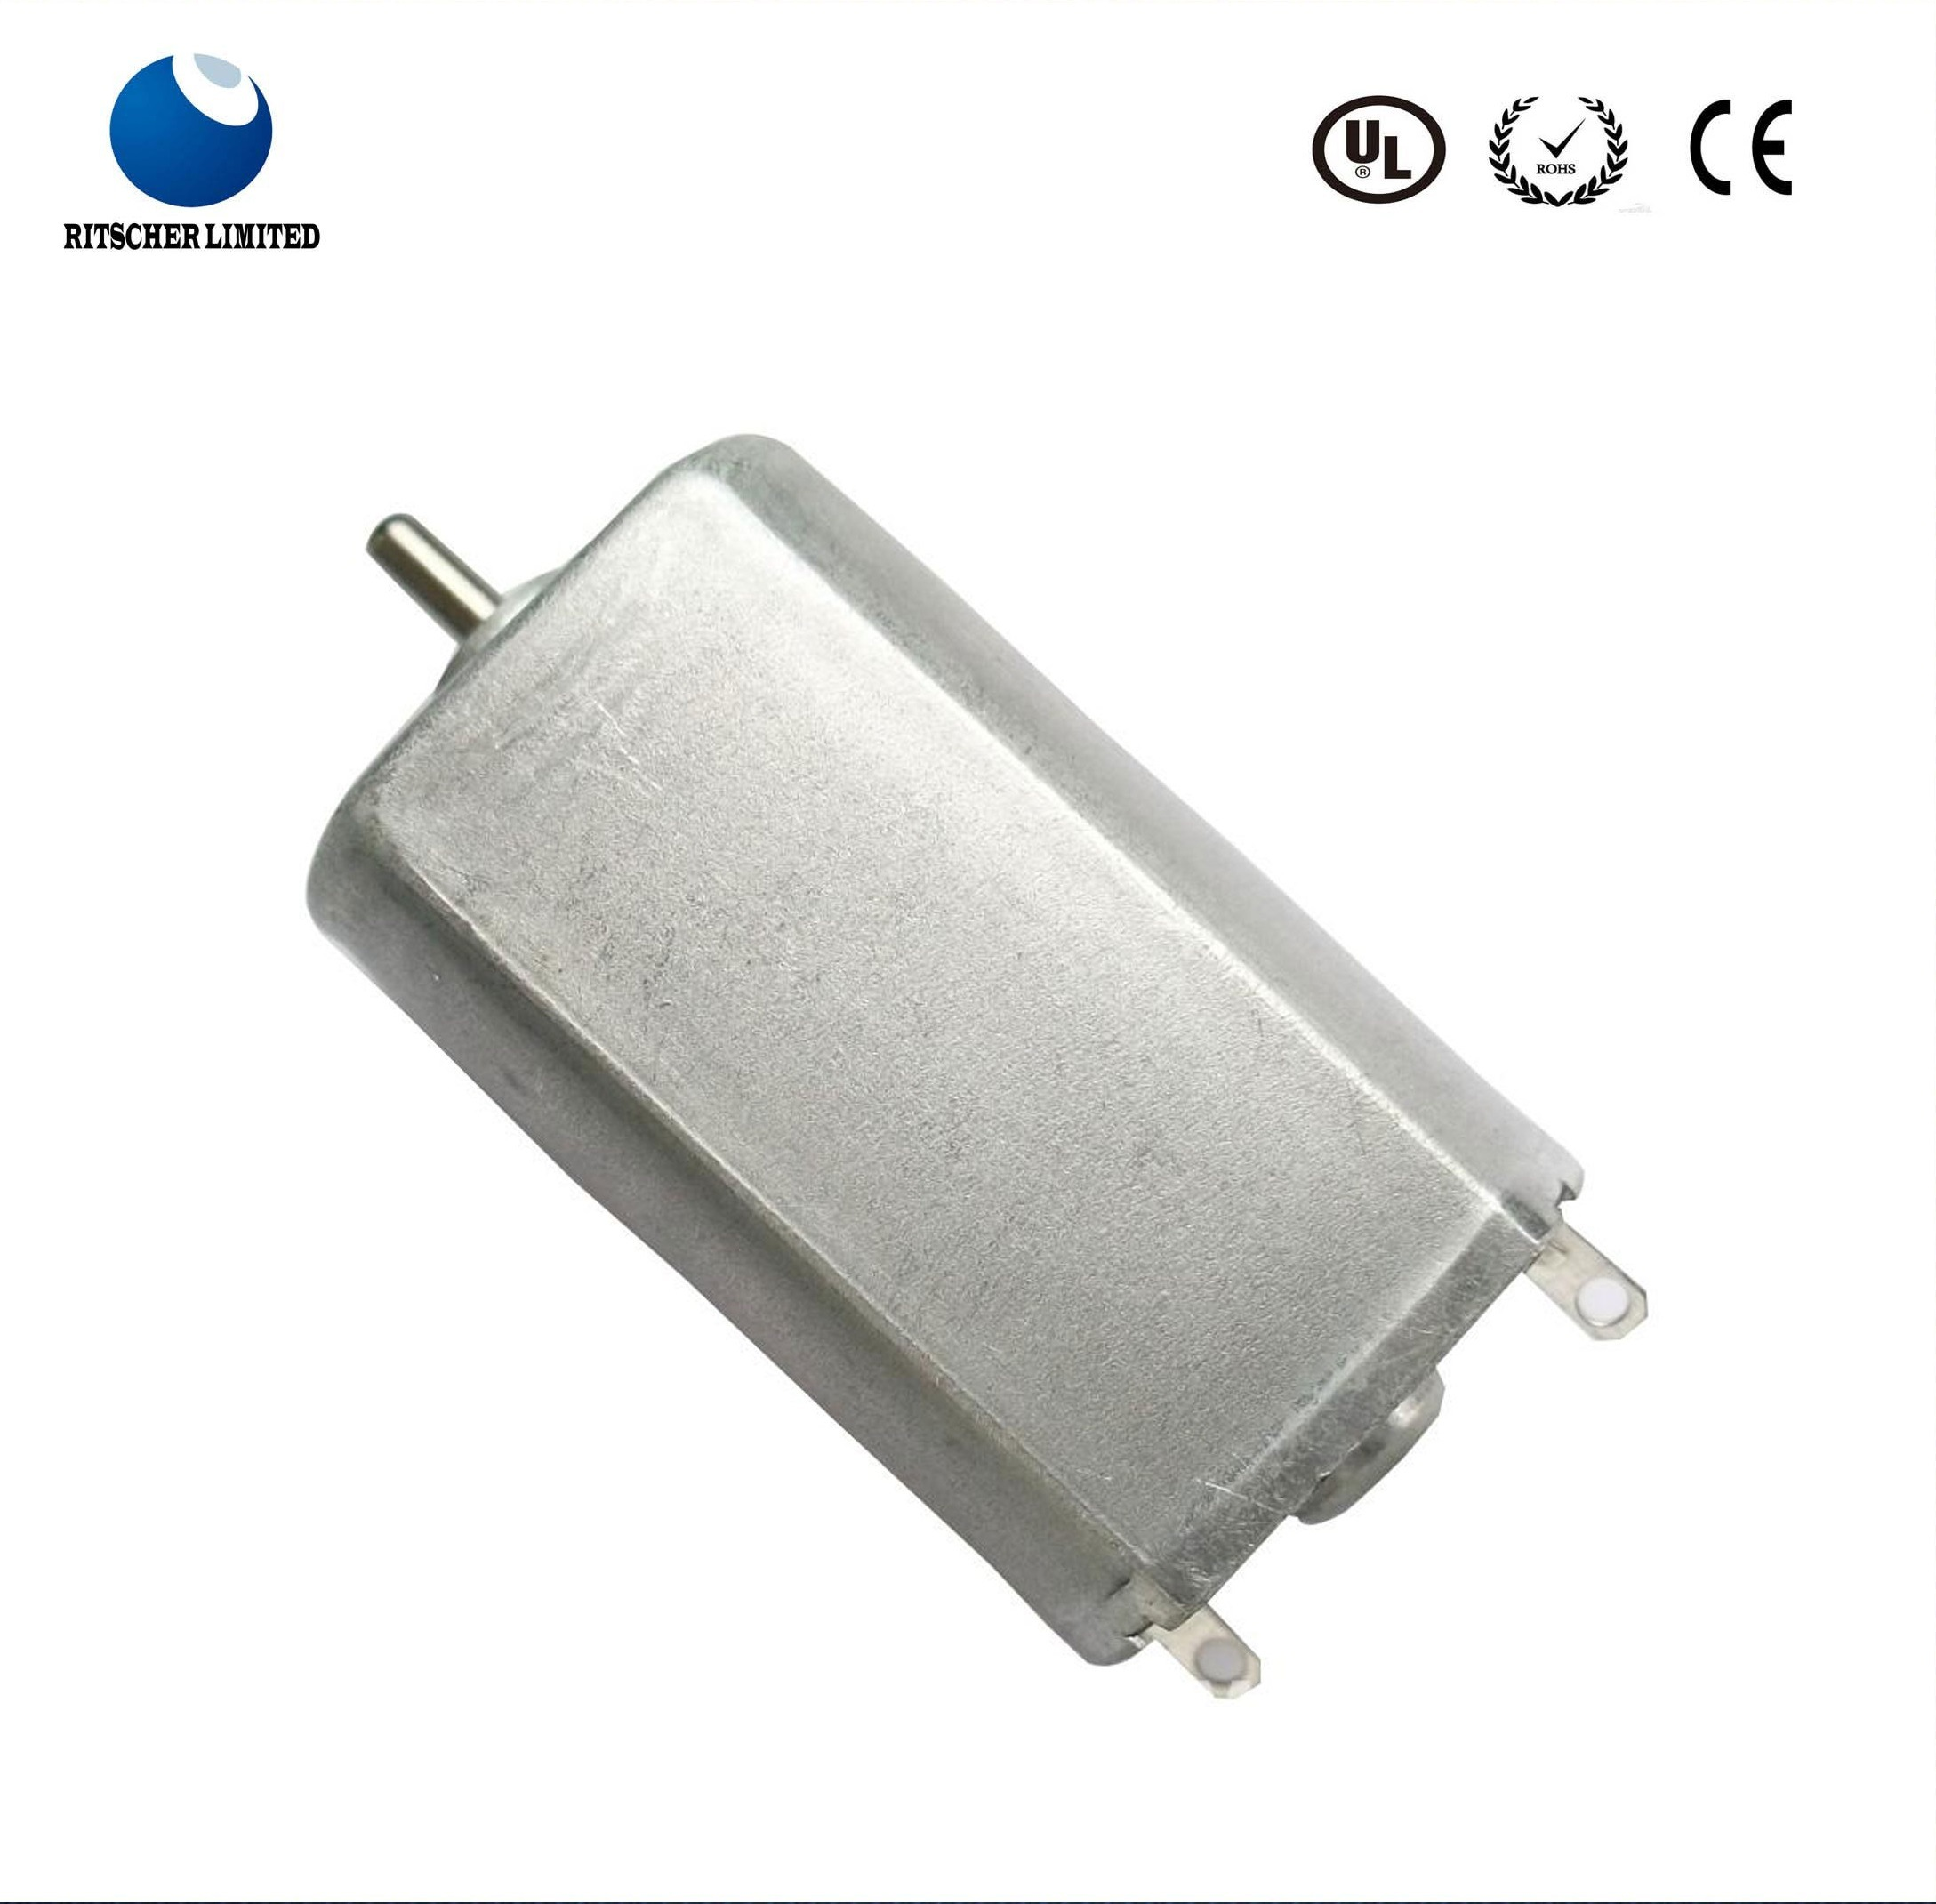 [Hot Item] Ce High Speed Mini Vibration DC Motors for Luna Beauty Apparatus